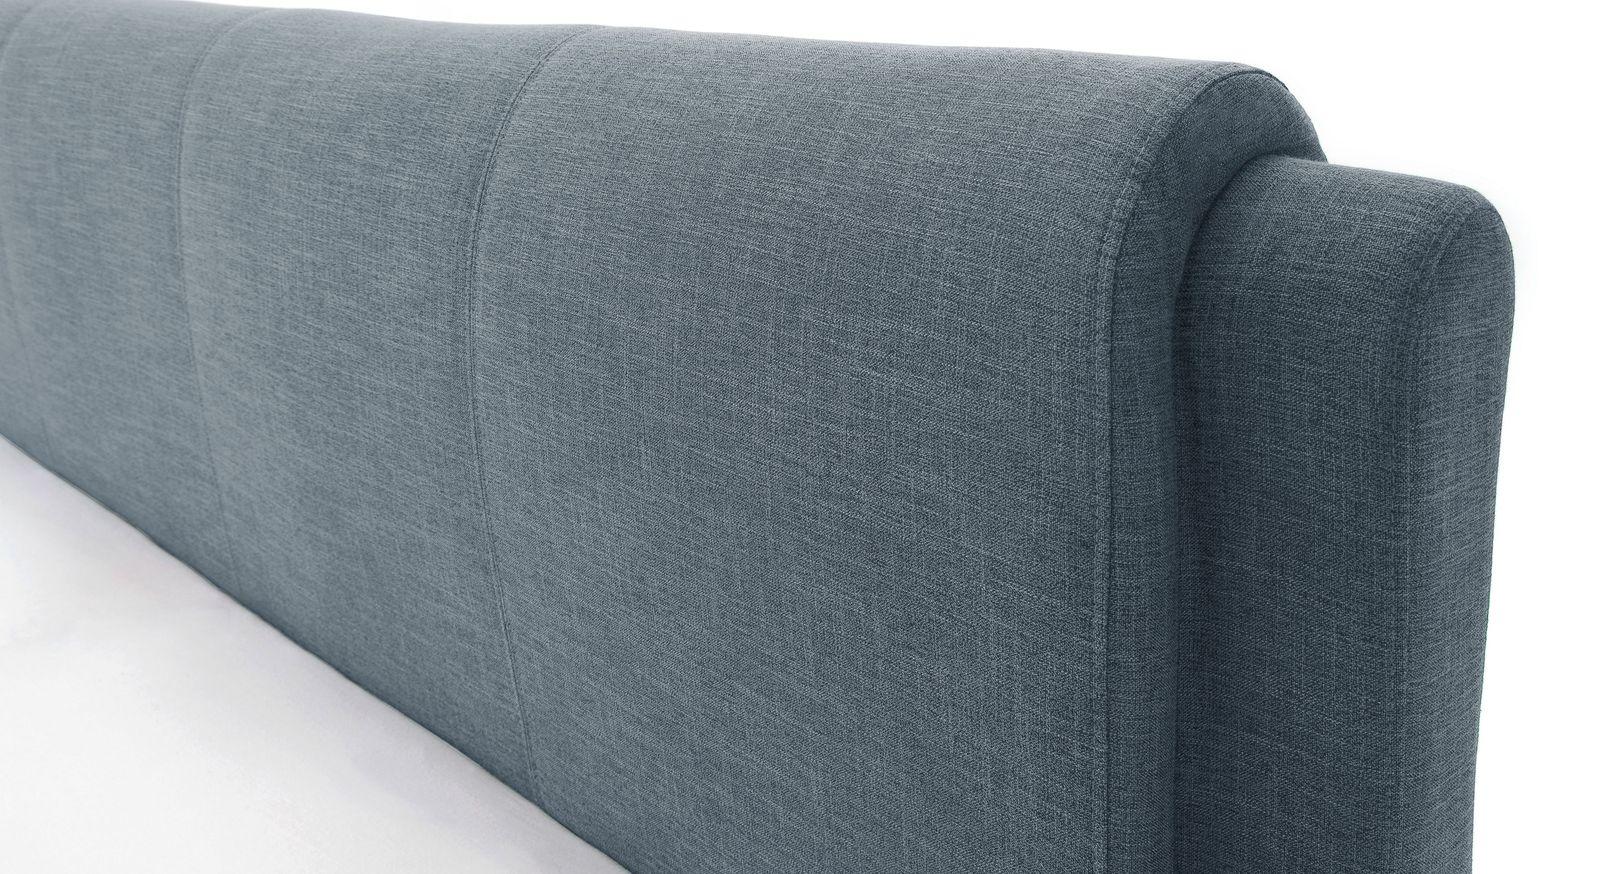 Bett La Marsa mit komfortabel gepolstertem Kopfteil